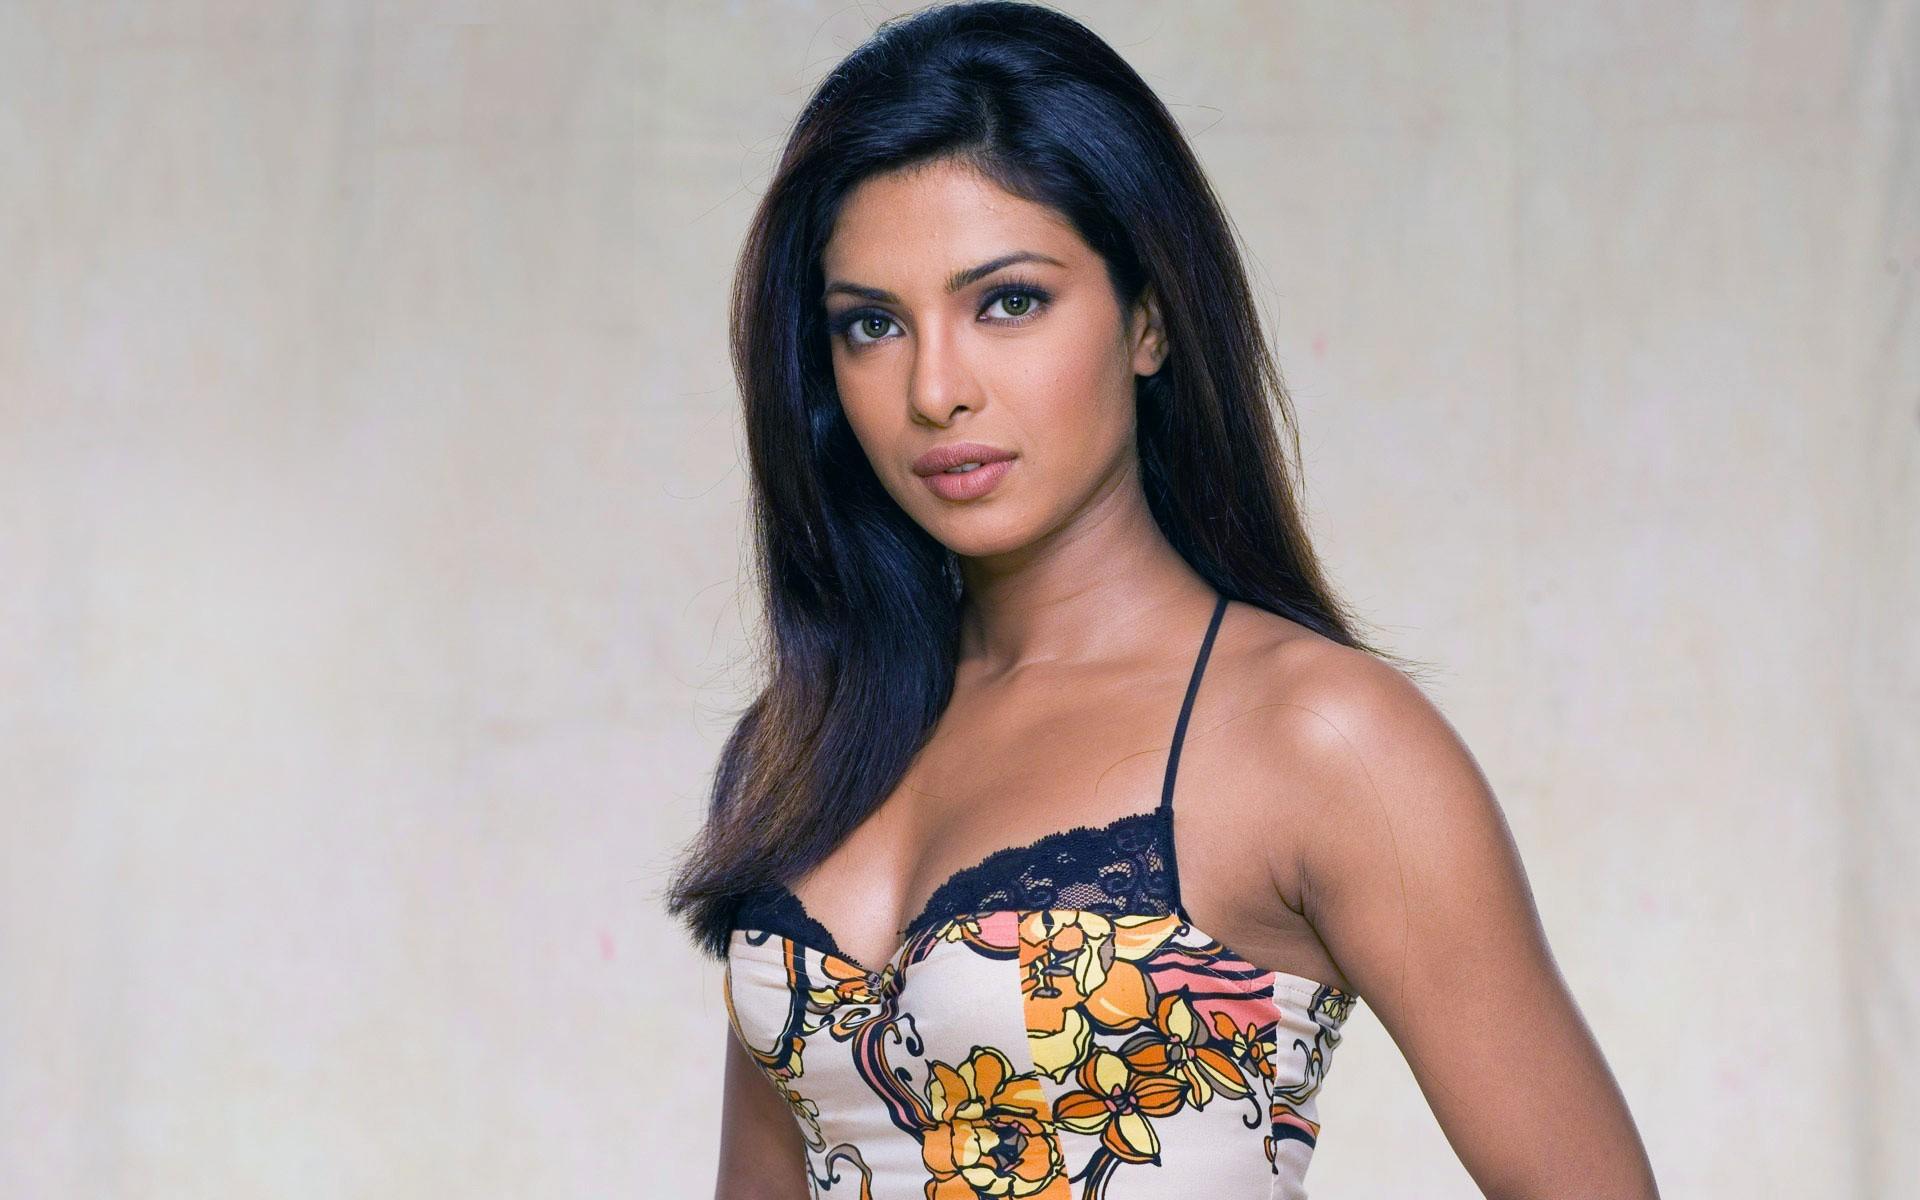 2048x1152 Priyanka Chopra 10 2048x1152 Resolution Hd 4k Wallpapers